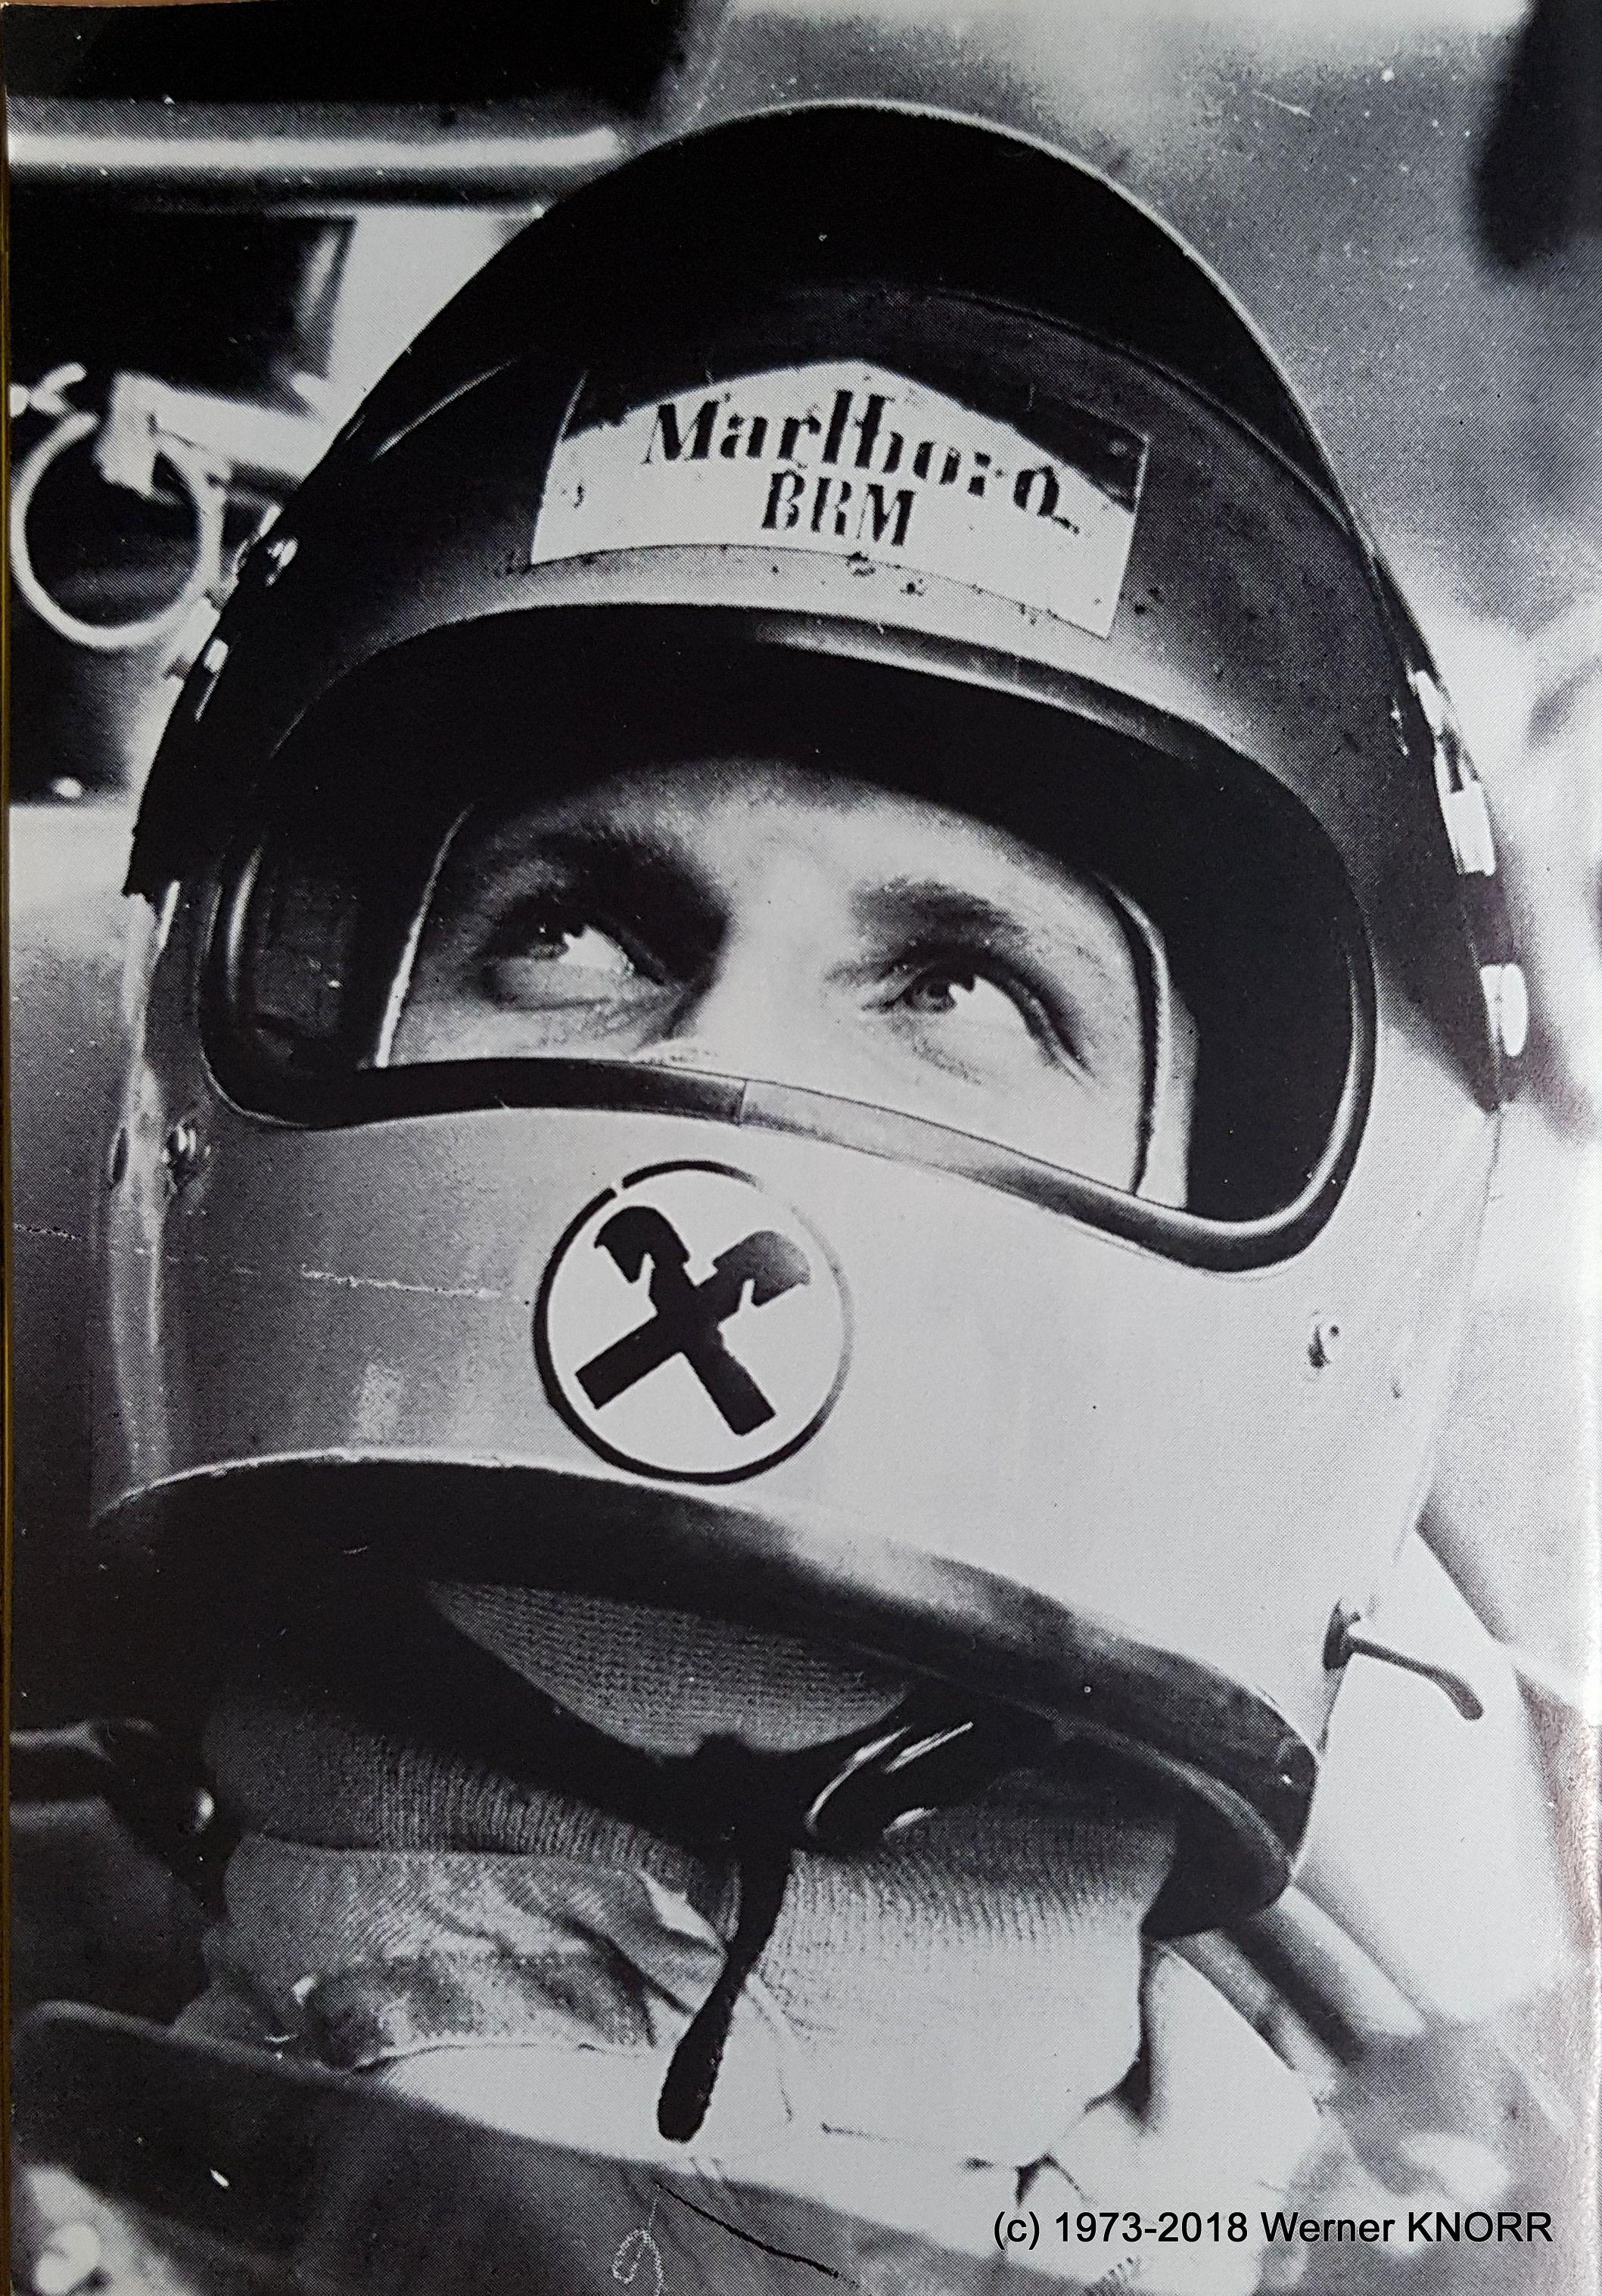 NIKI LAUDA STARS ganz privat 1973 c Werner KNORR